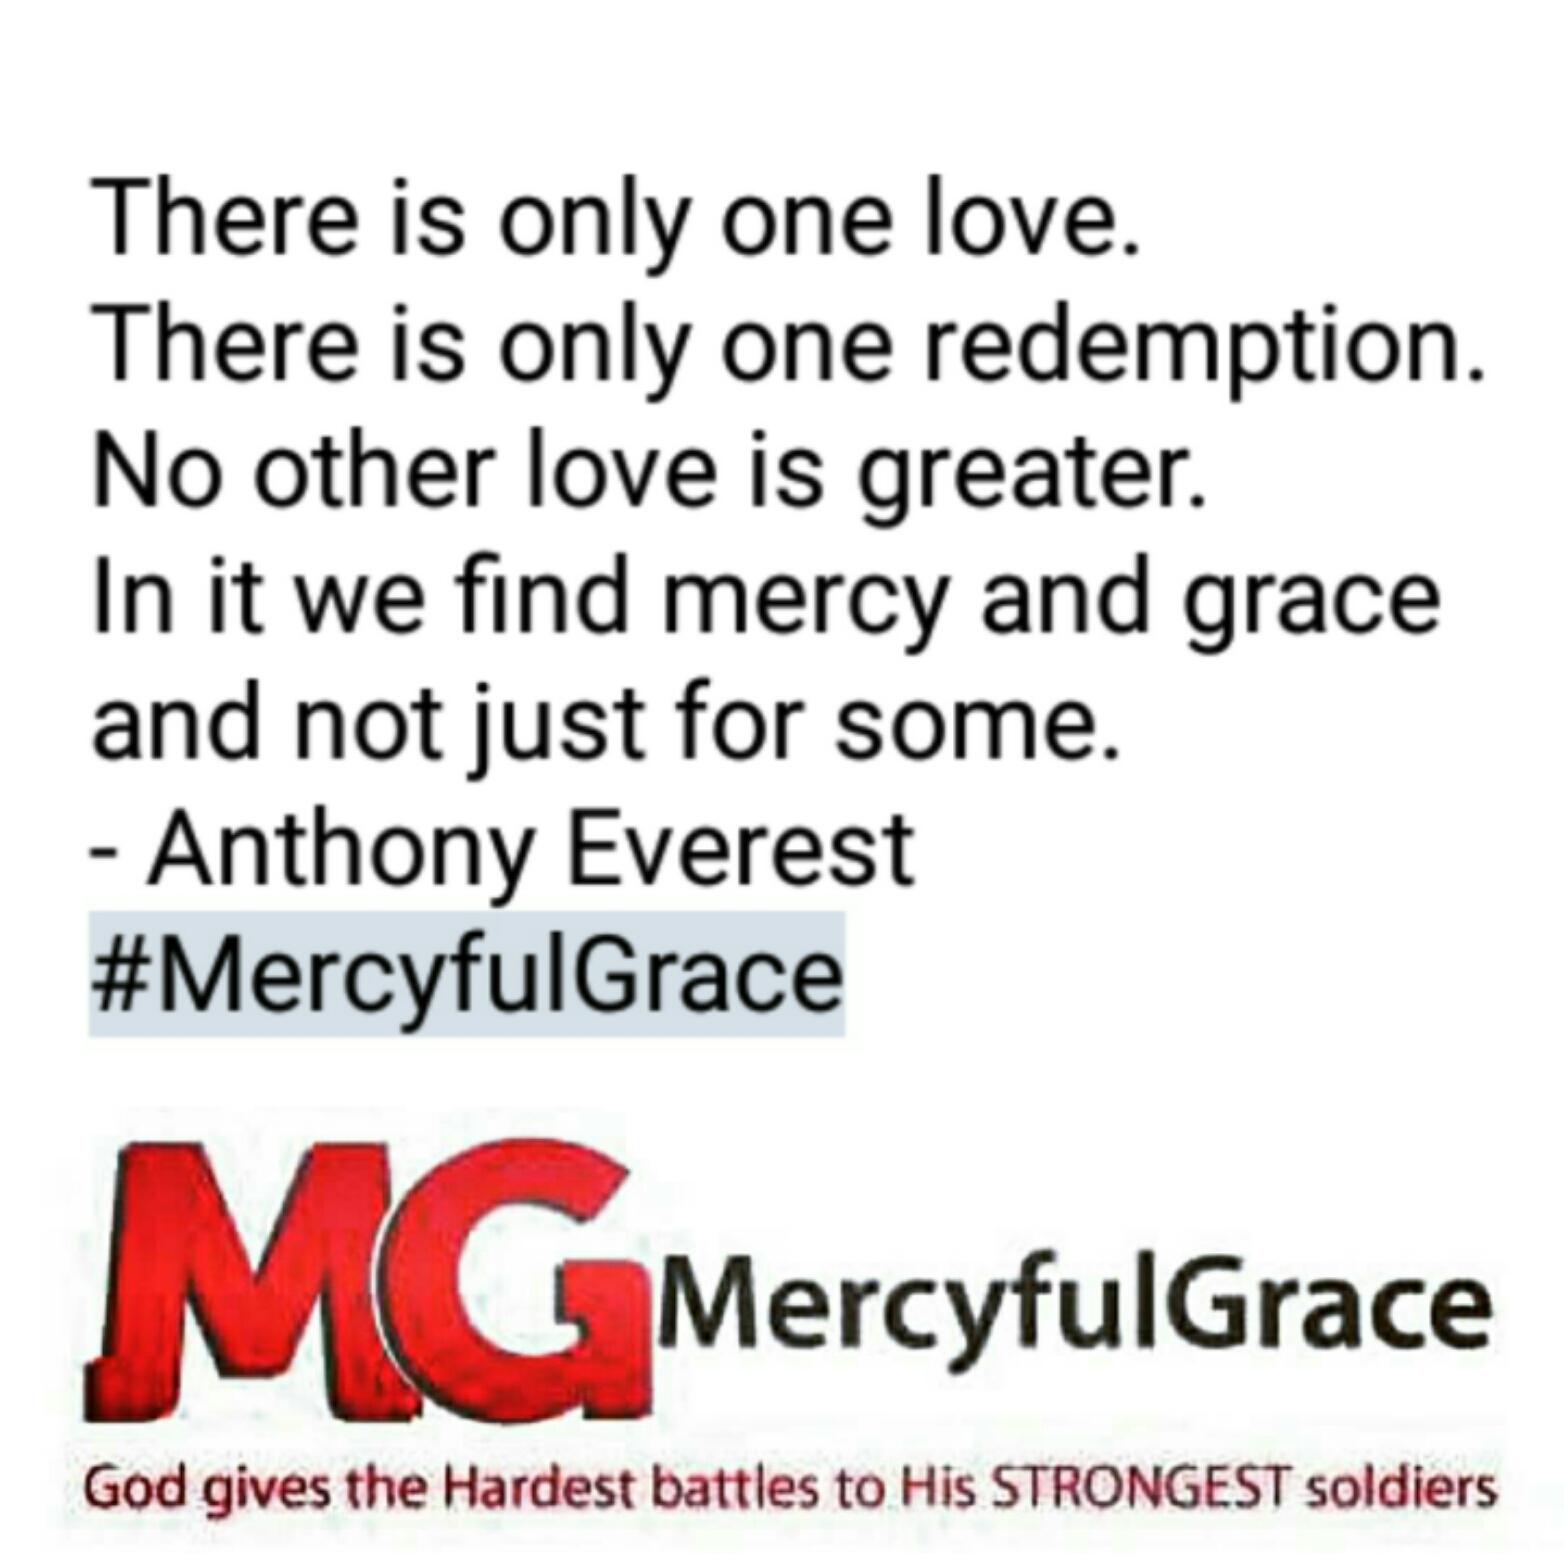 REDEMEMOTION - ANTHONY EVEREST - MERCYFULGRACE